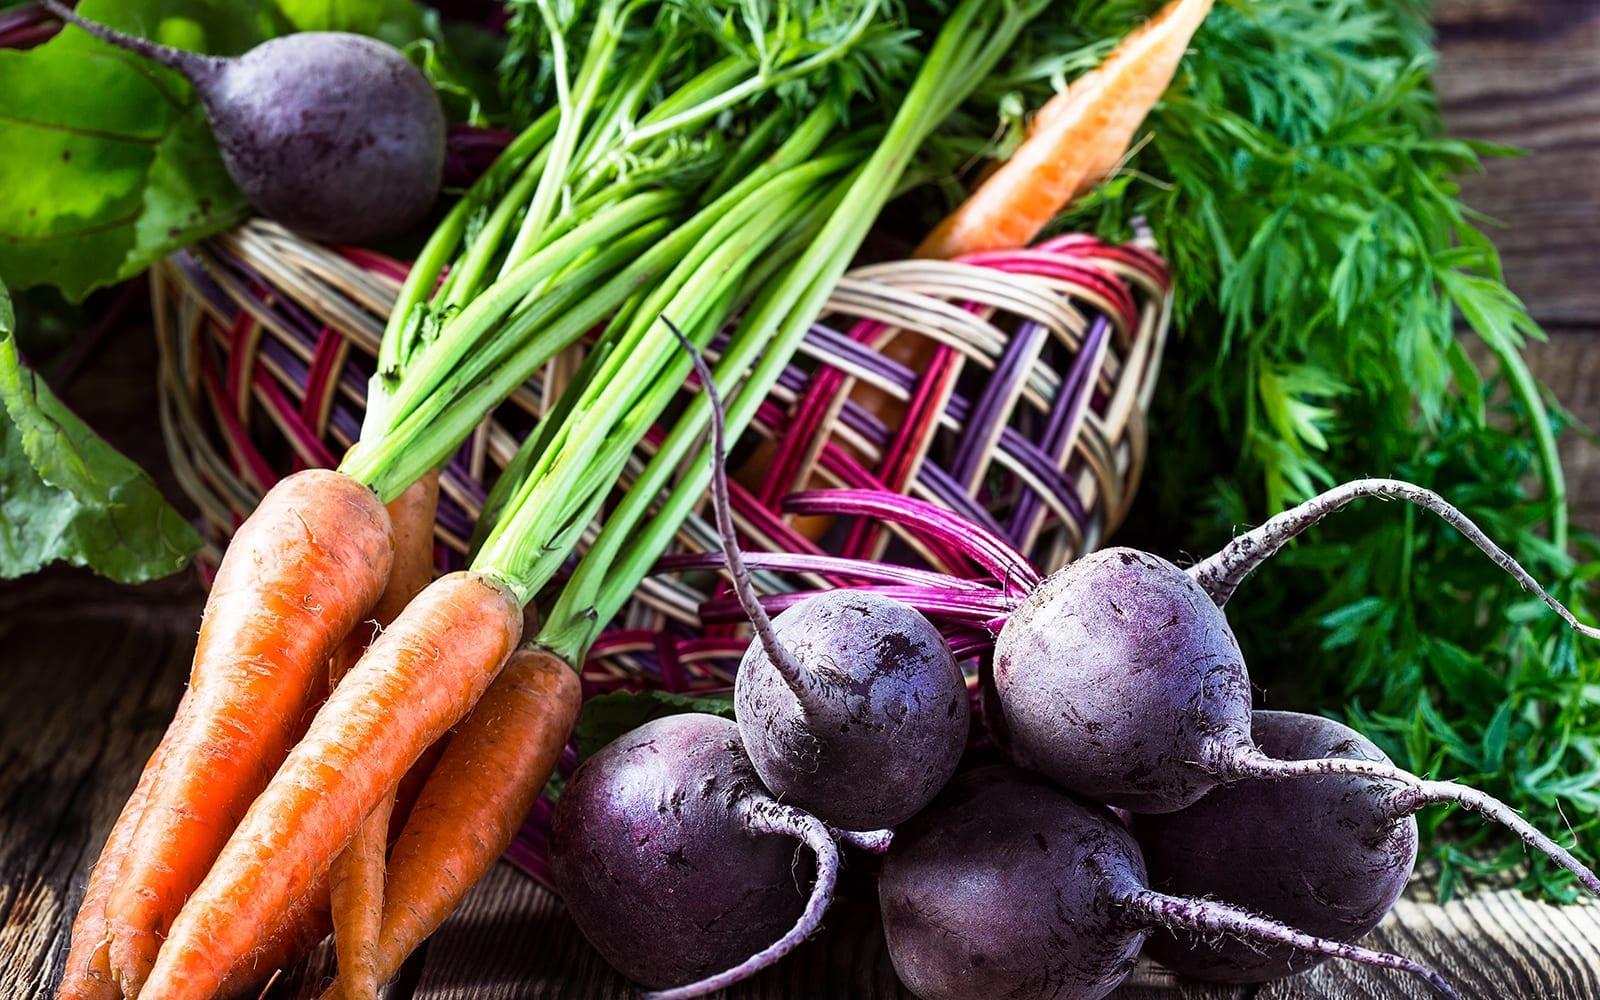 Assortment of Root Vegetables